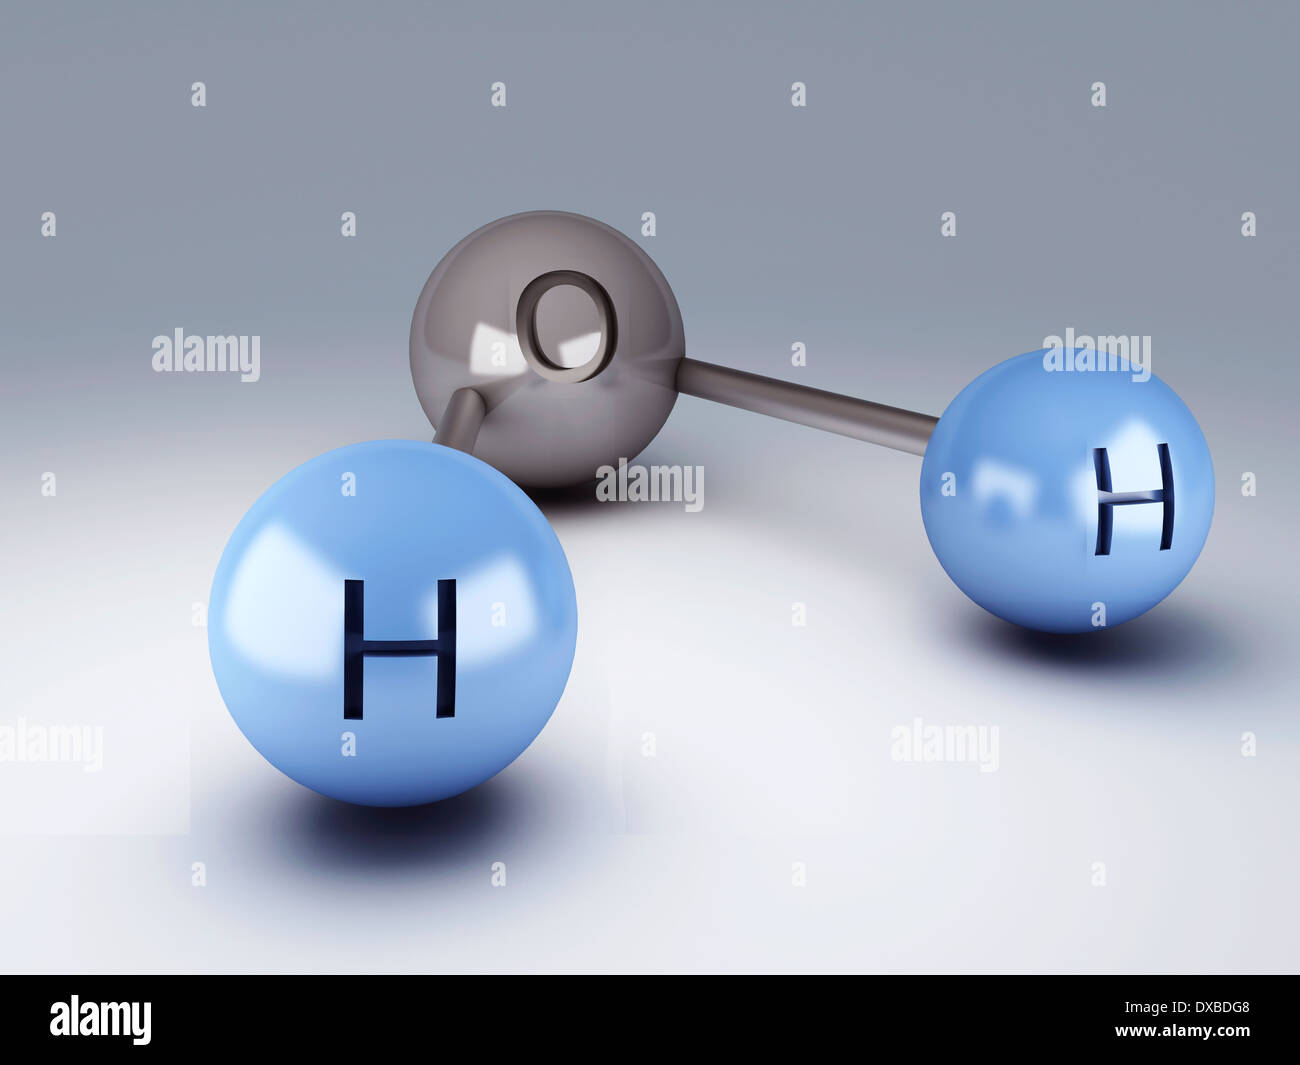 H2O Molecule 3d illustration Stock Photo: 67864280 - Alamy